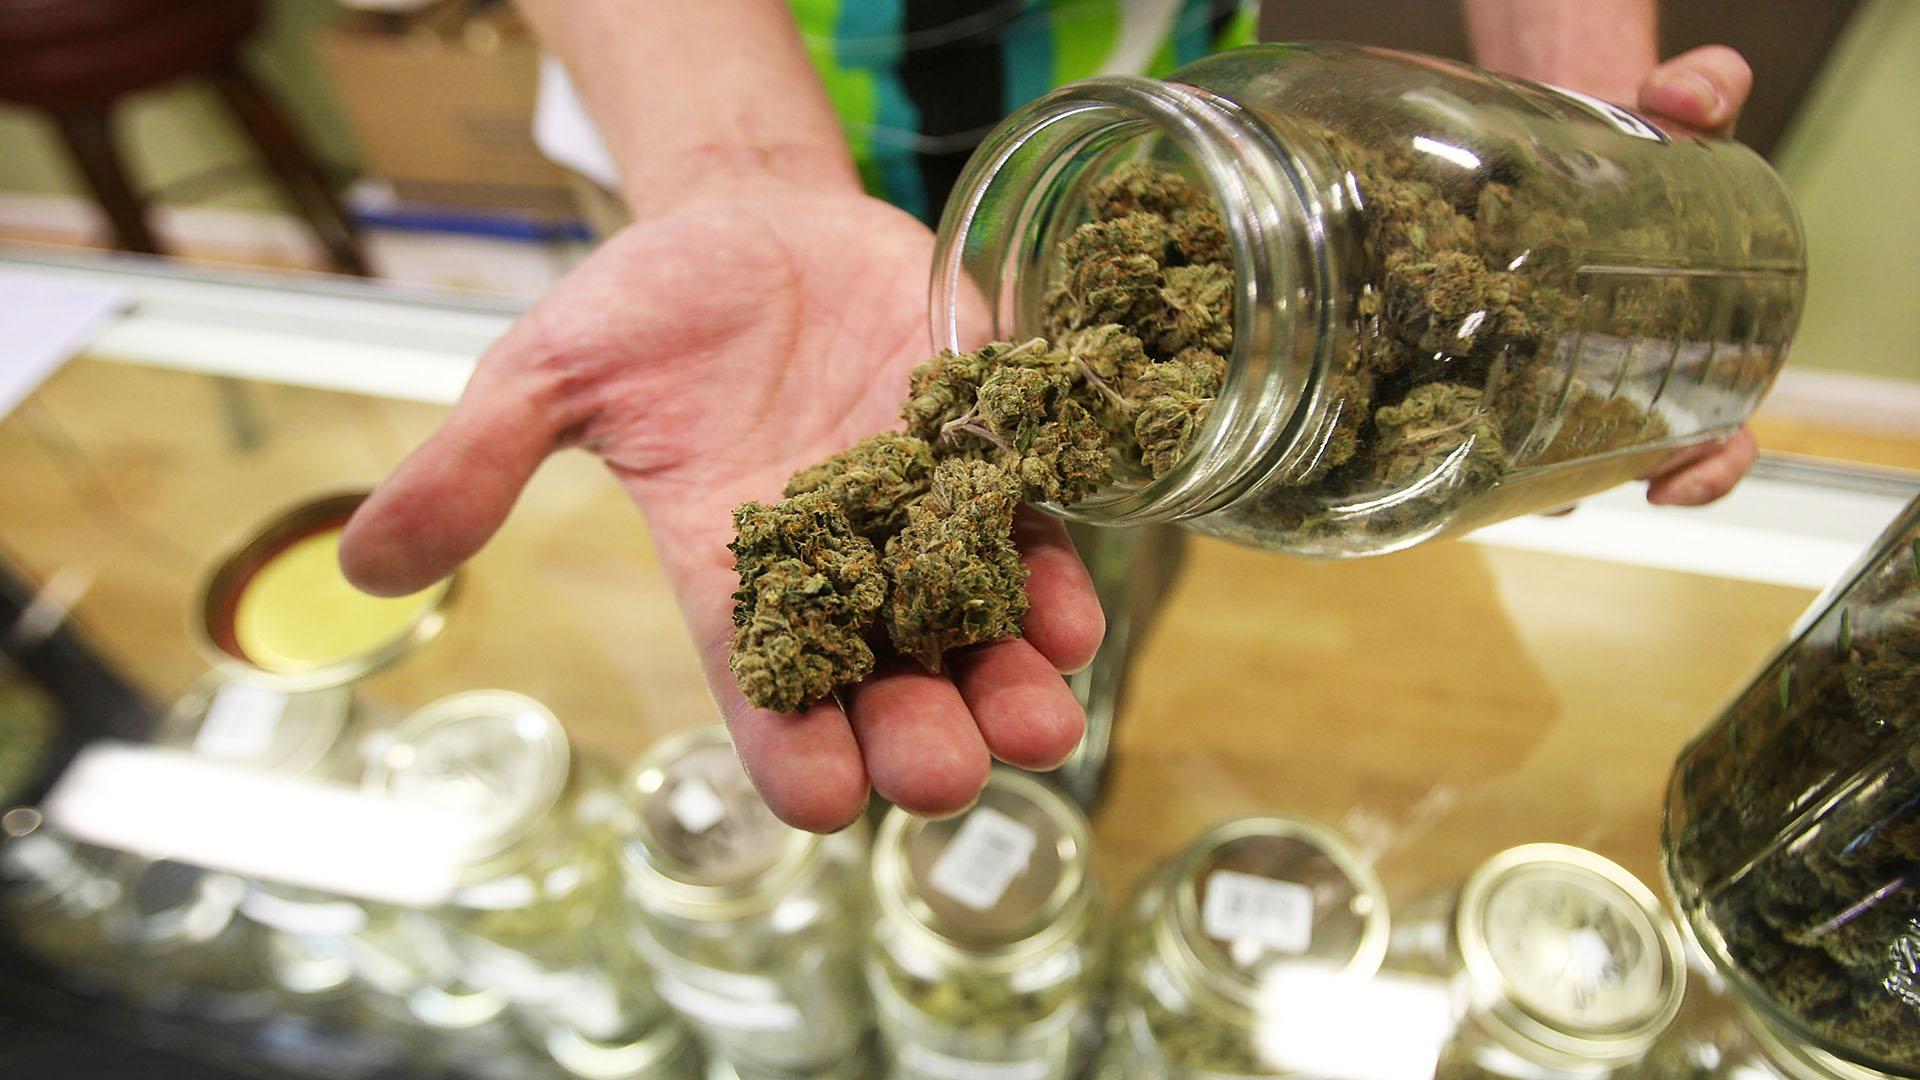 marijuana from jar